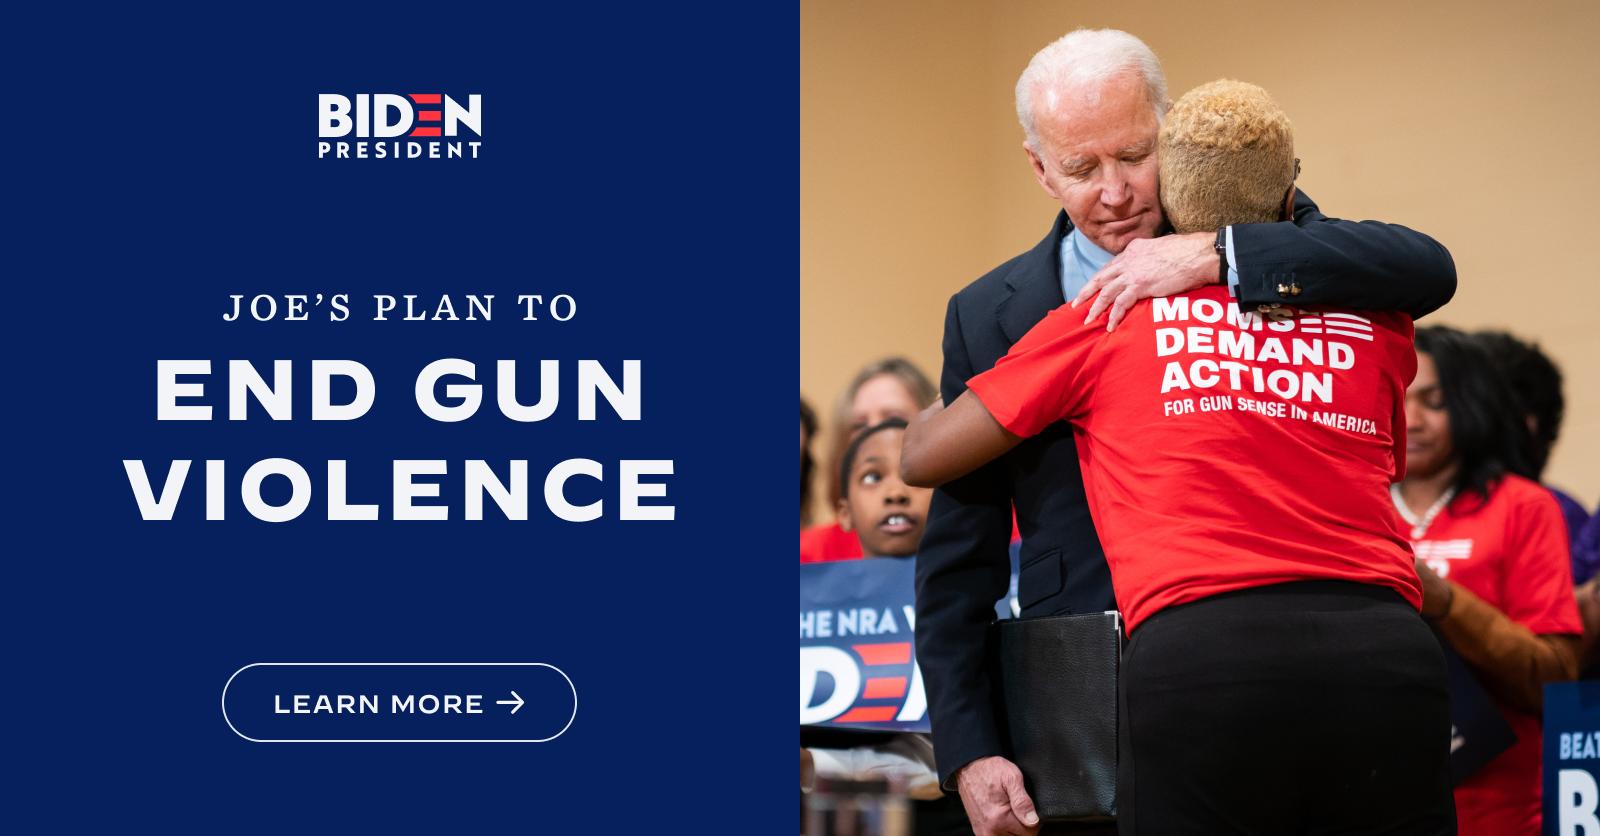 Joe Biden S Plan To End Gun Violence Joe Biden For President